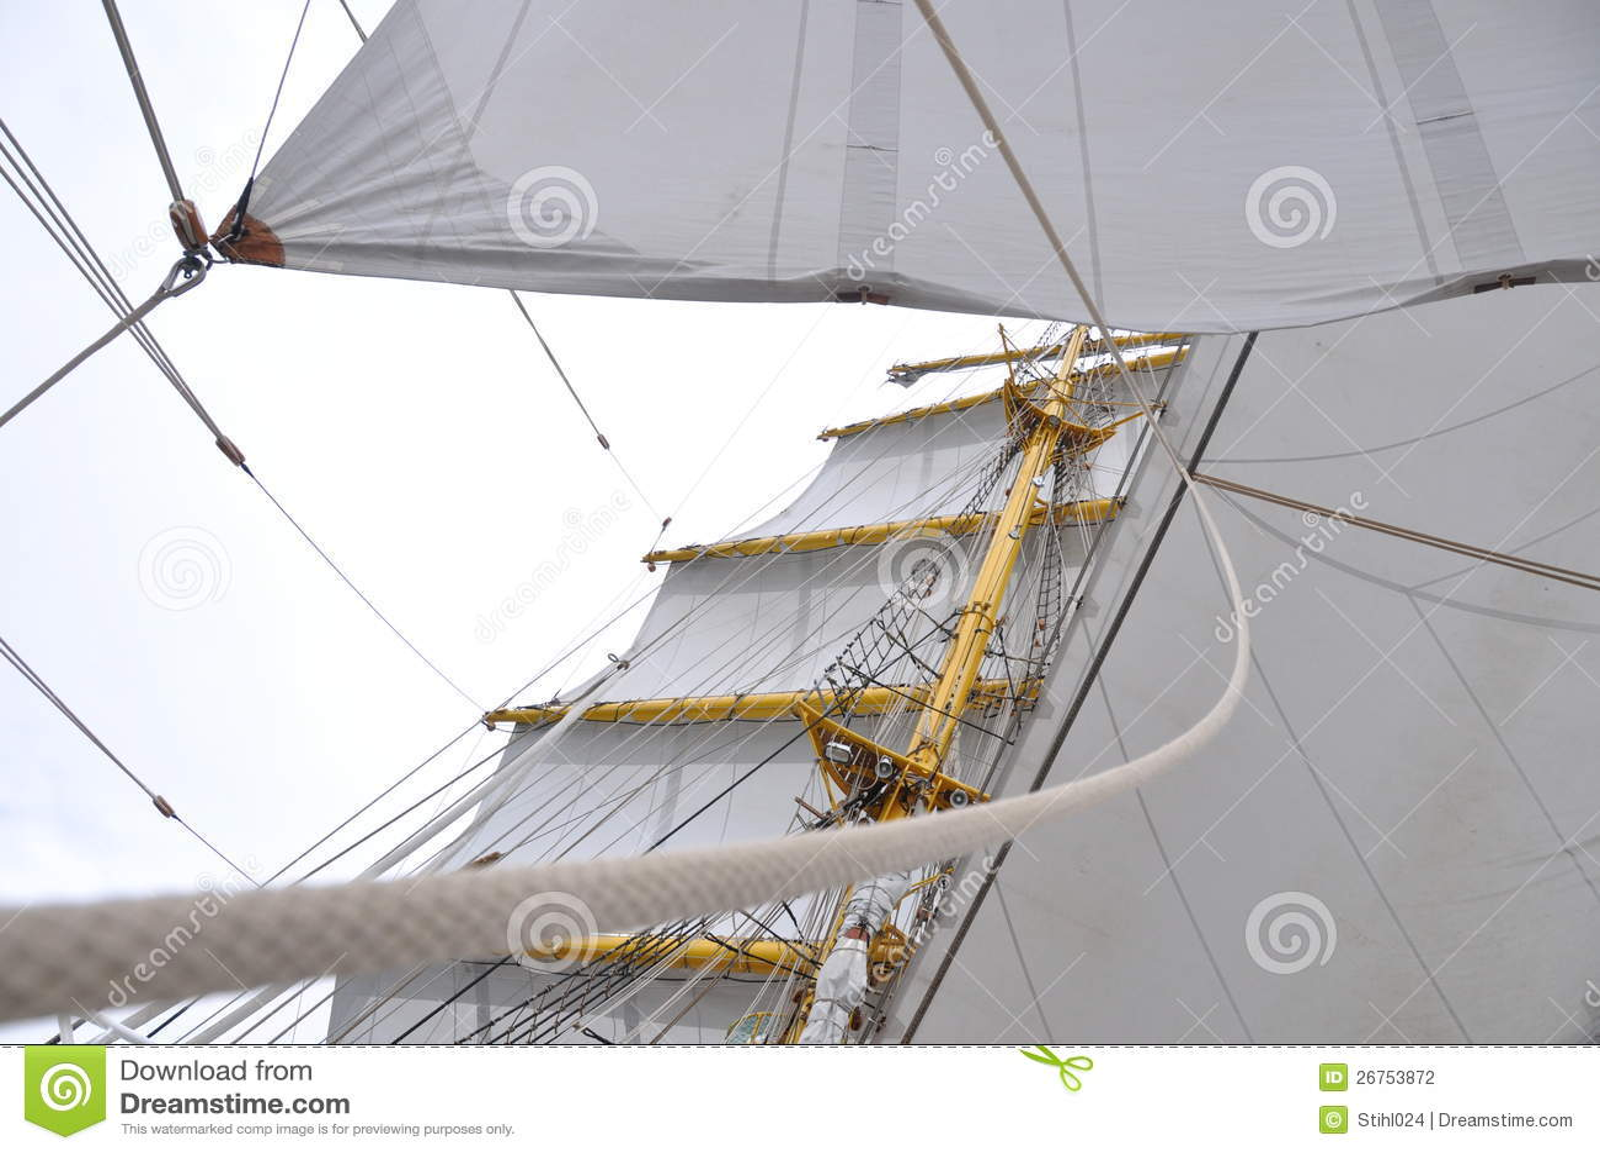 Traditional sail rig